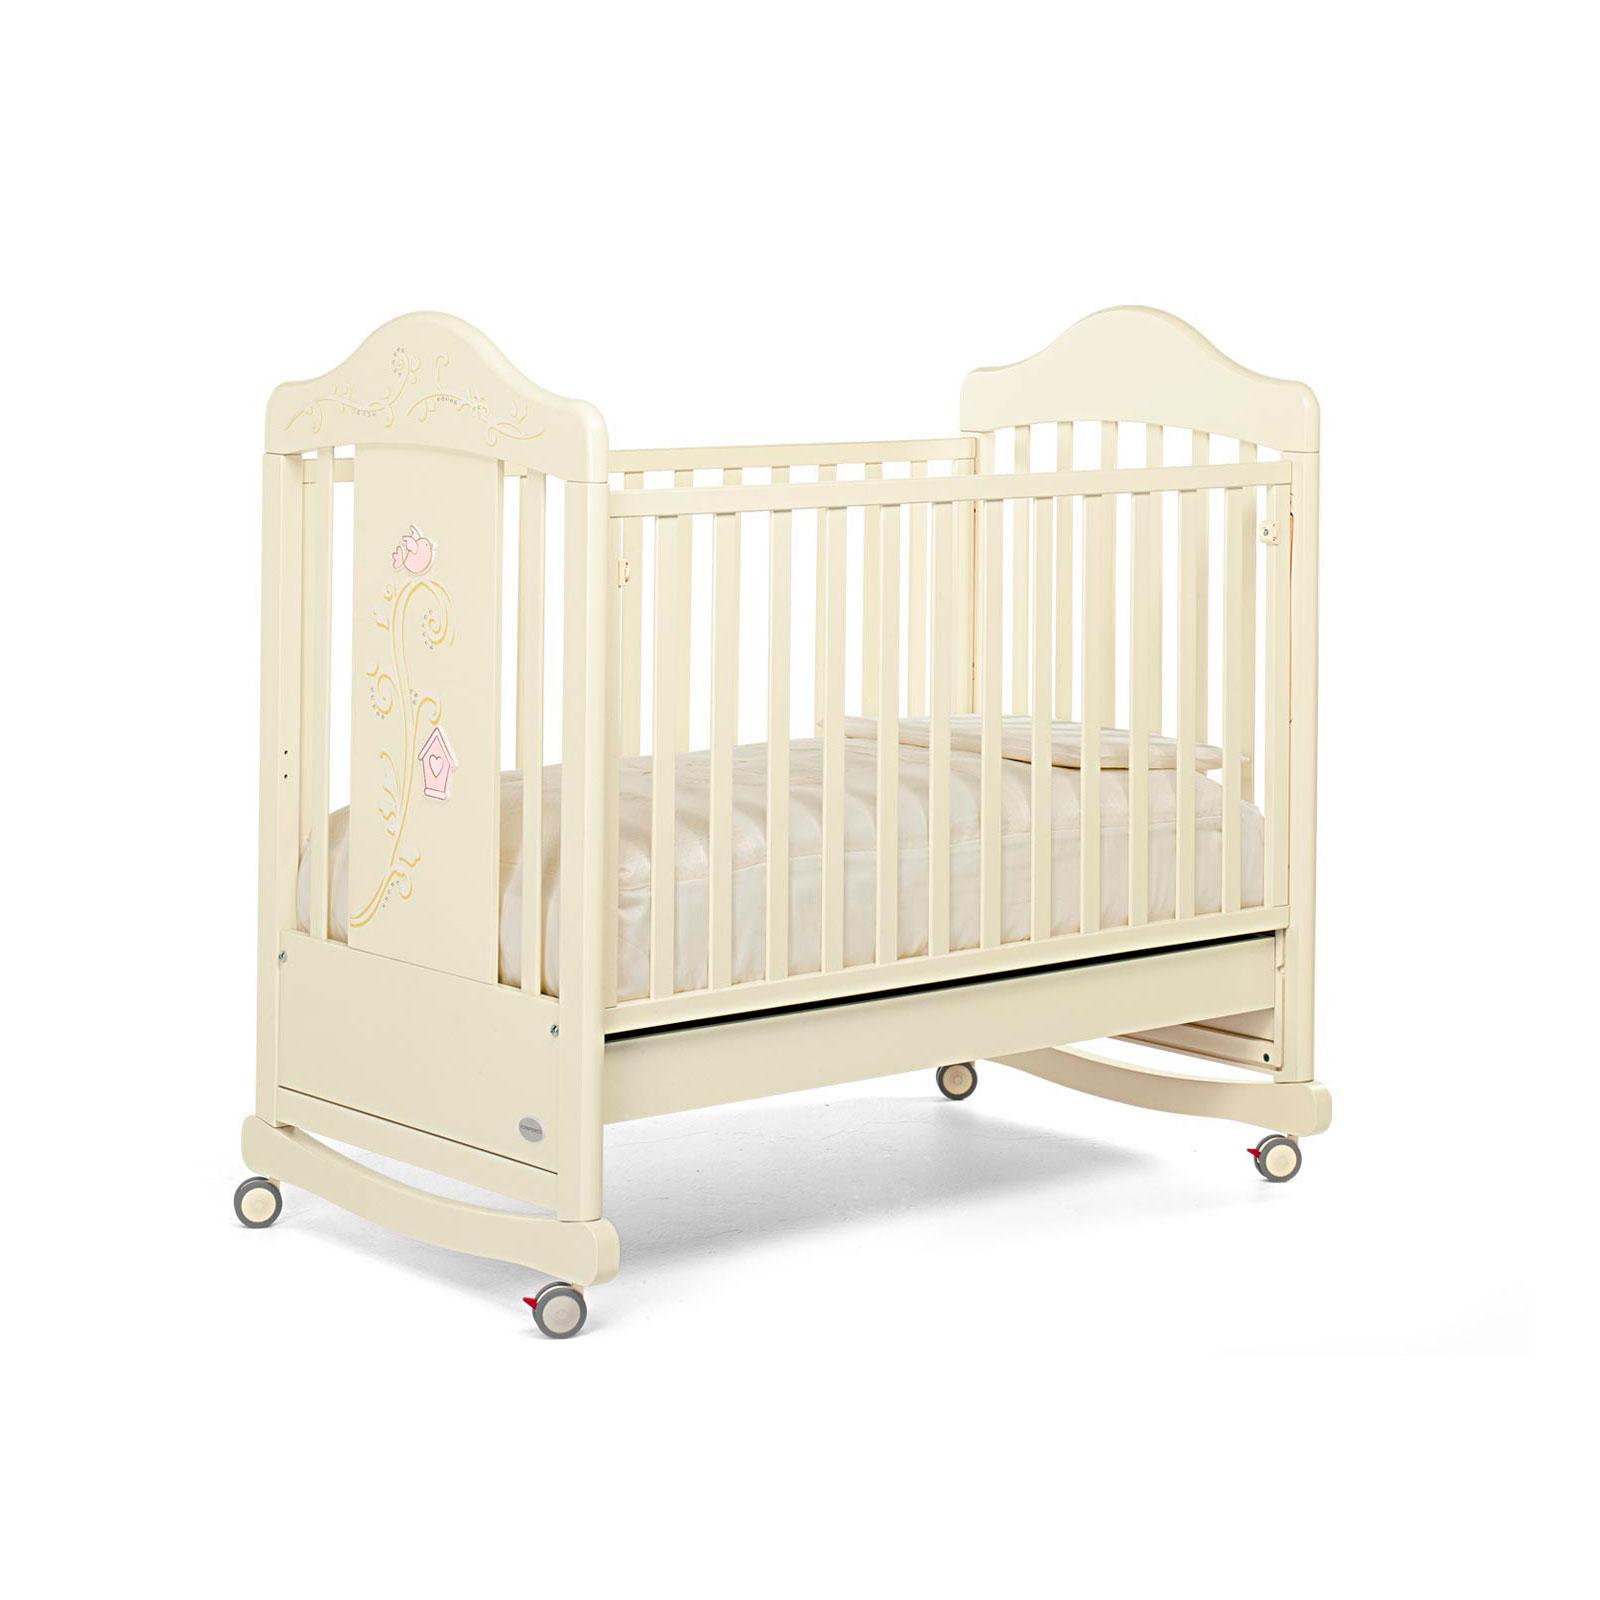 Кровать Foppapedretti Baby Nido Lettino 125x65 см<br>